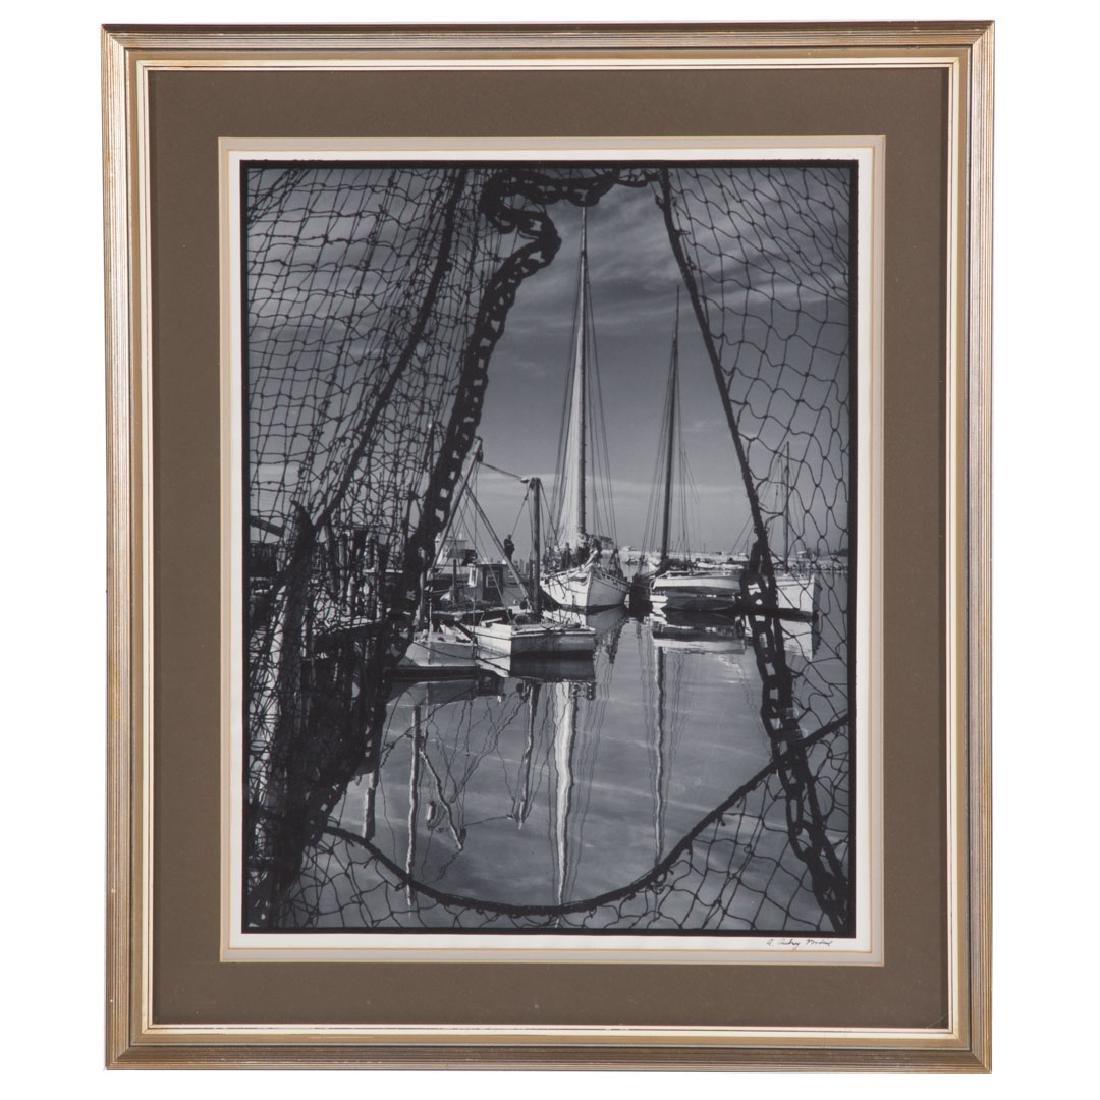 A. Aubrey Bodine. Dock Scene, photograph